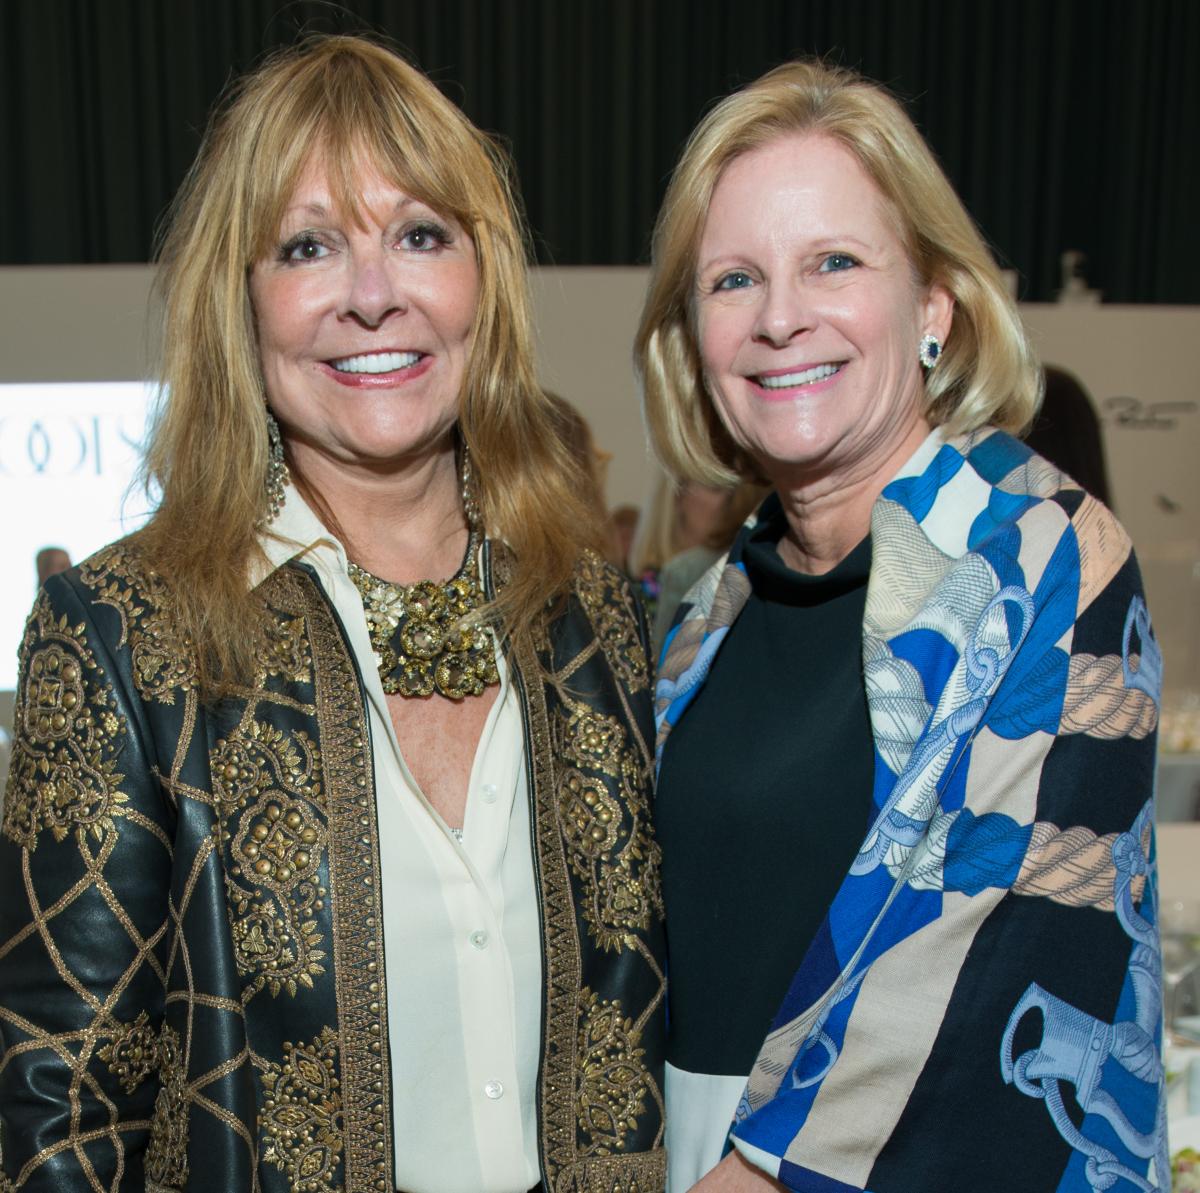 Meg Goodman, Laurie Liedtke at Oscar de la Renta fashion show at MFAH